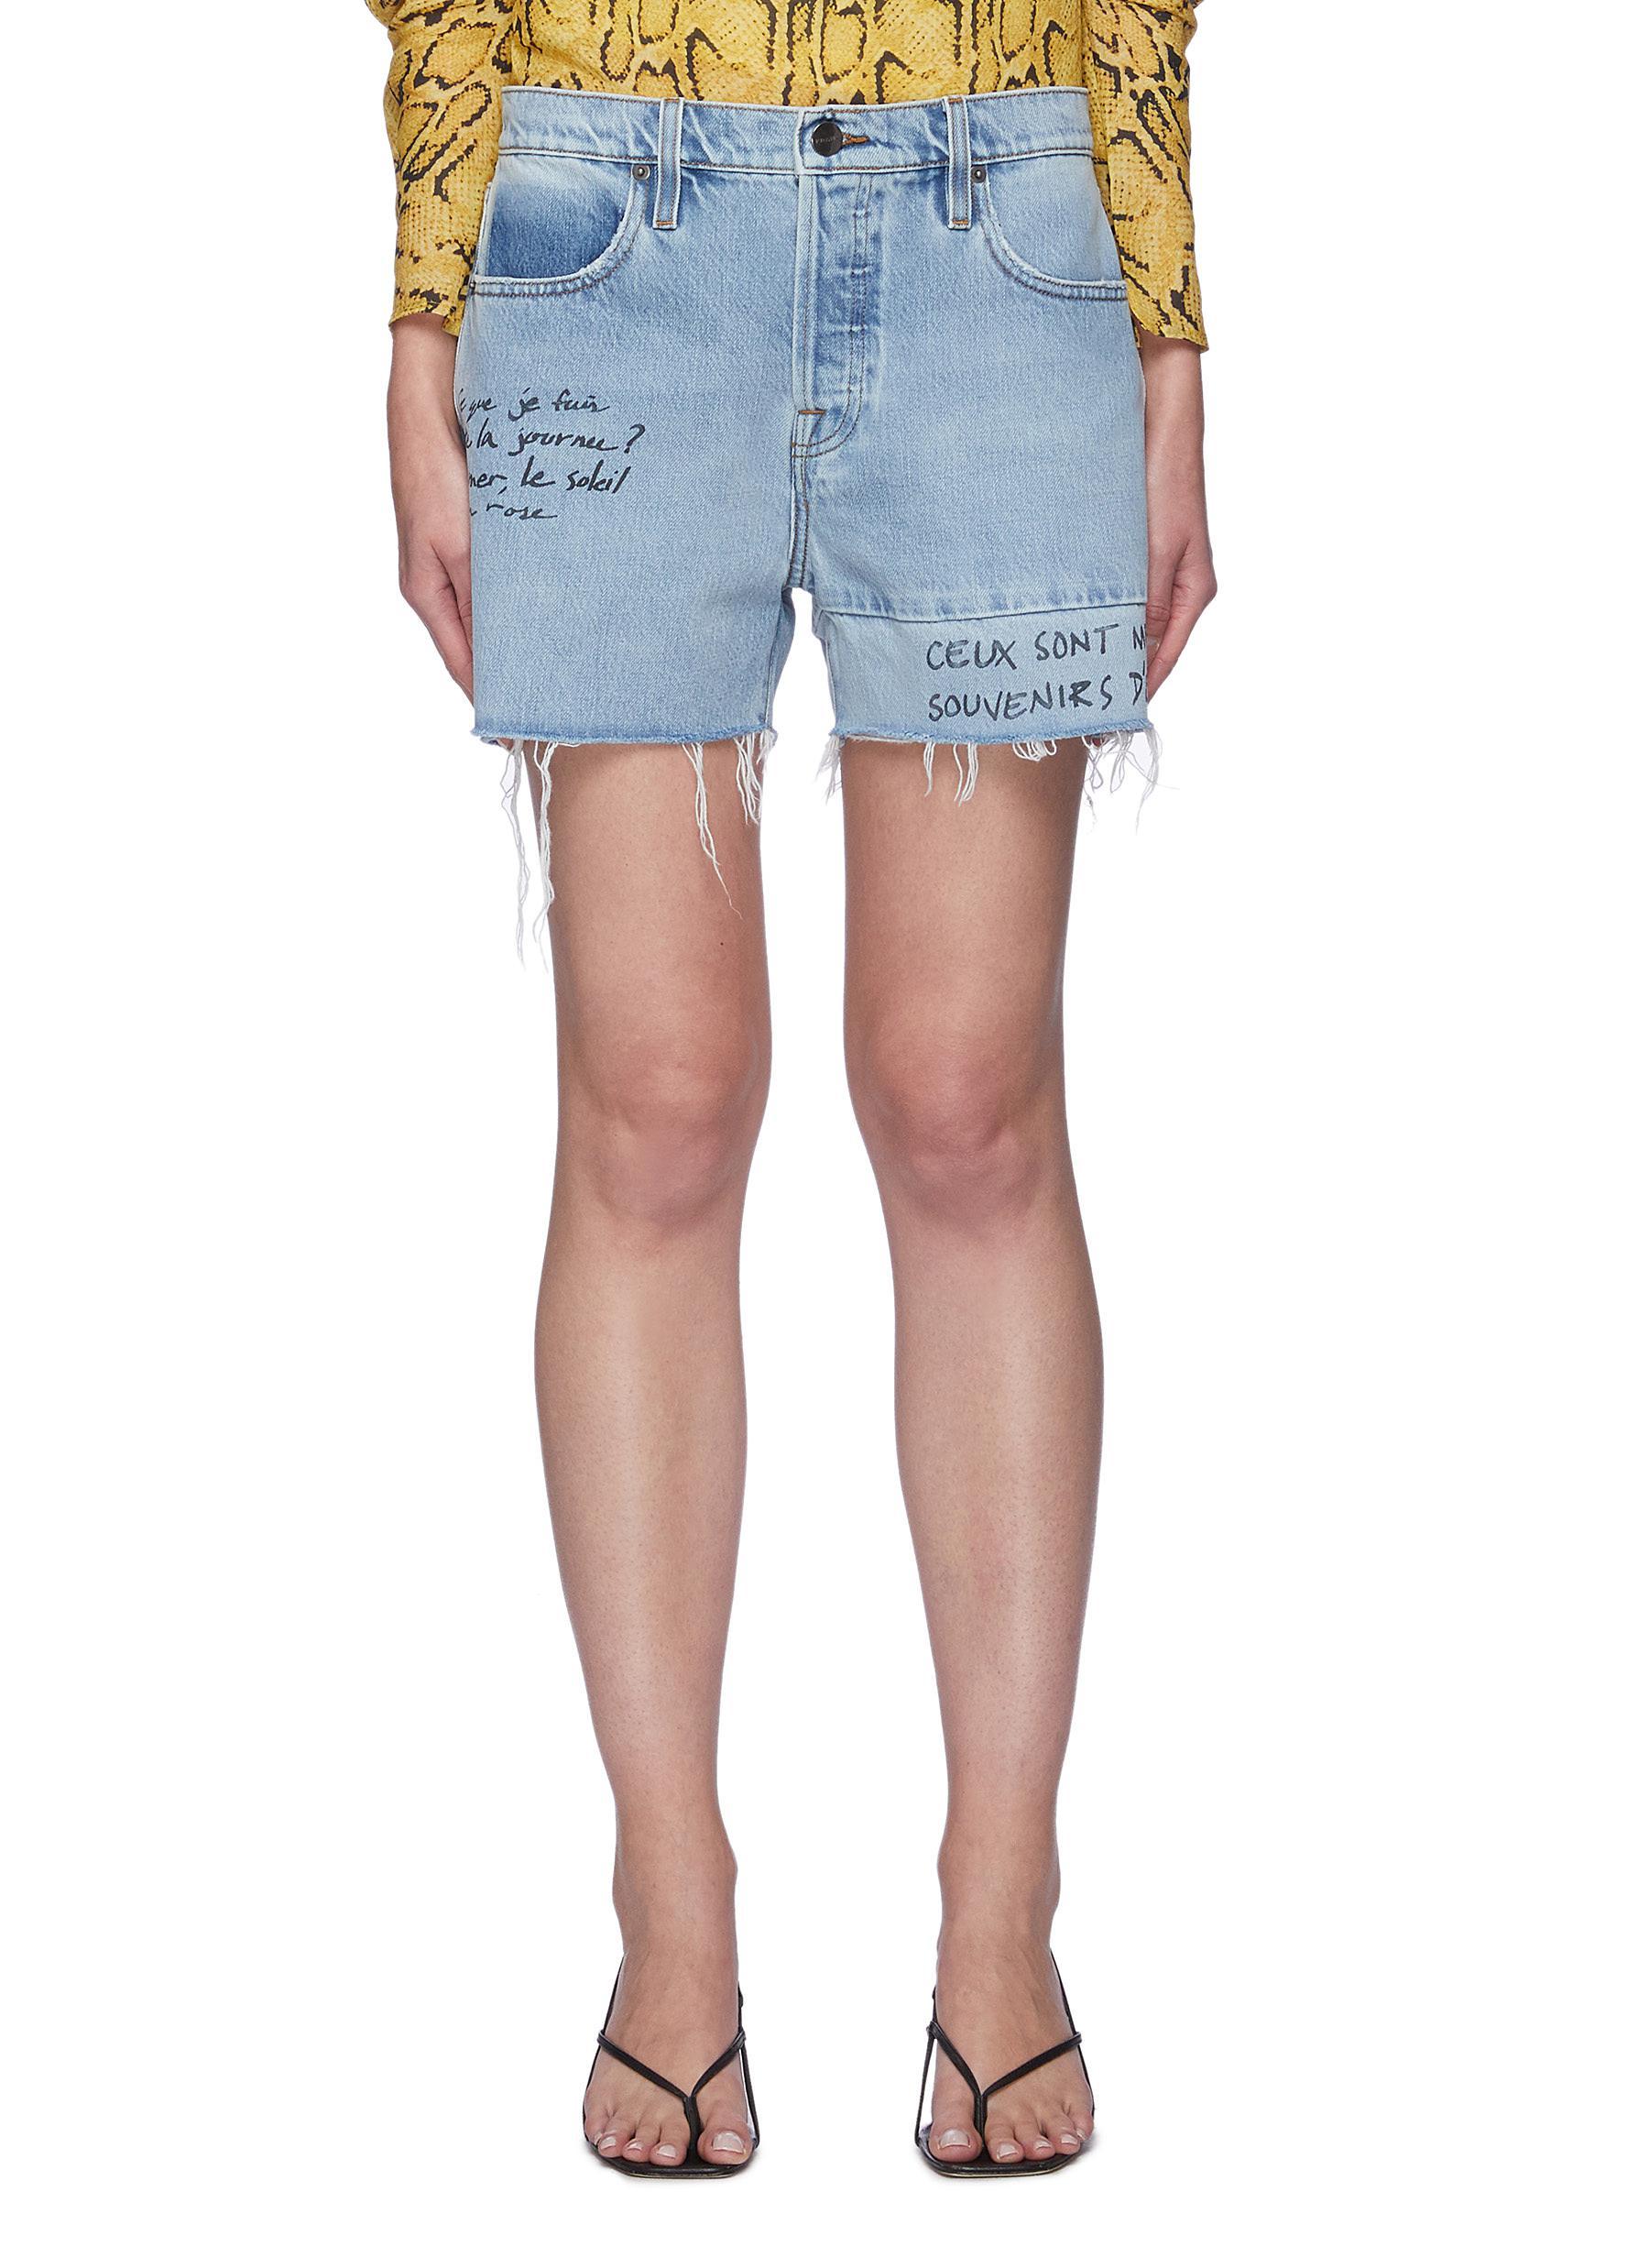 """""Le Slouch' Handwritten Print Frayed Hem Denim Shorts"""